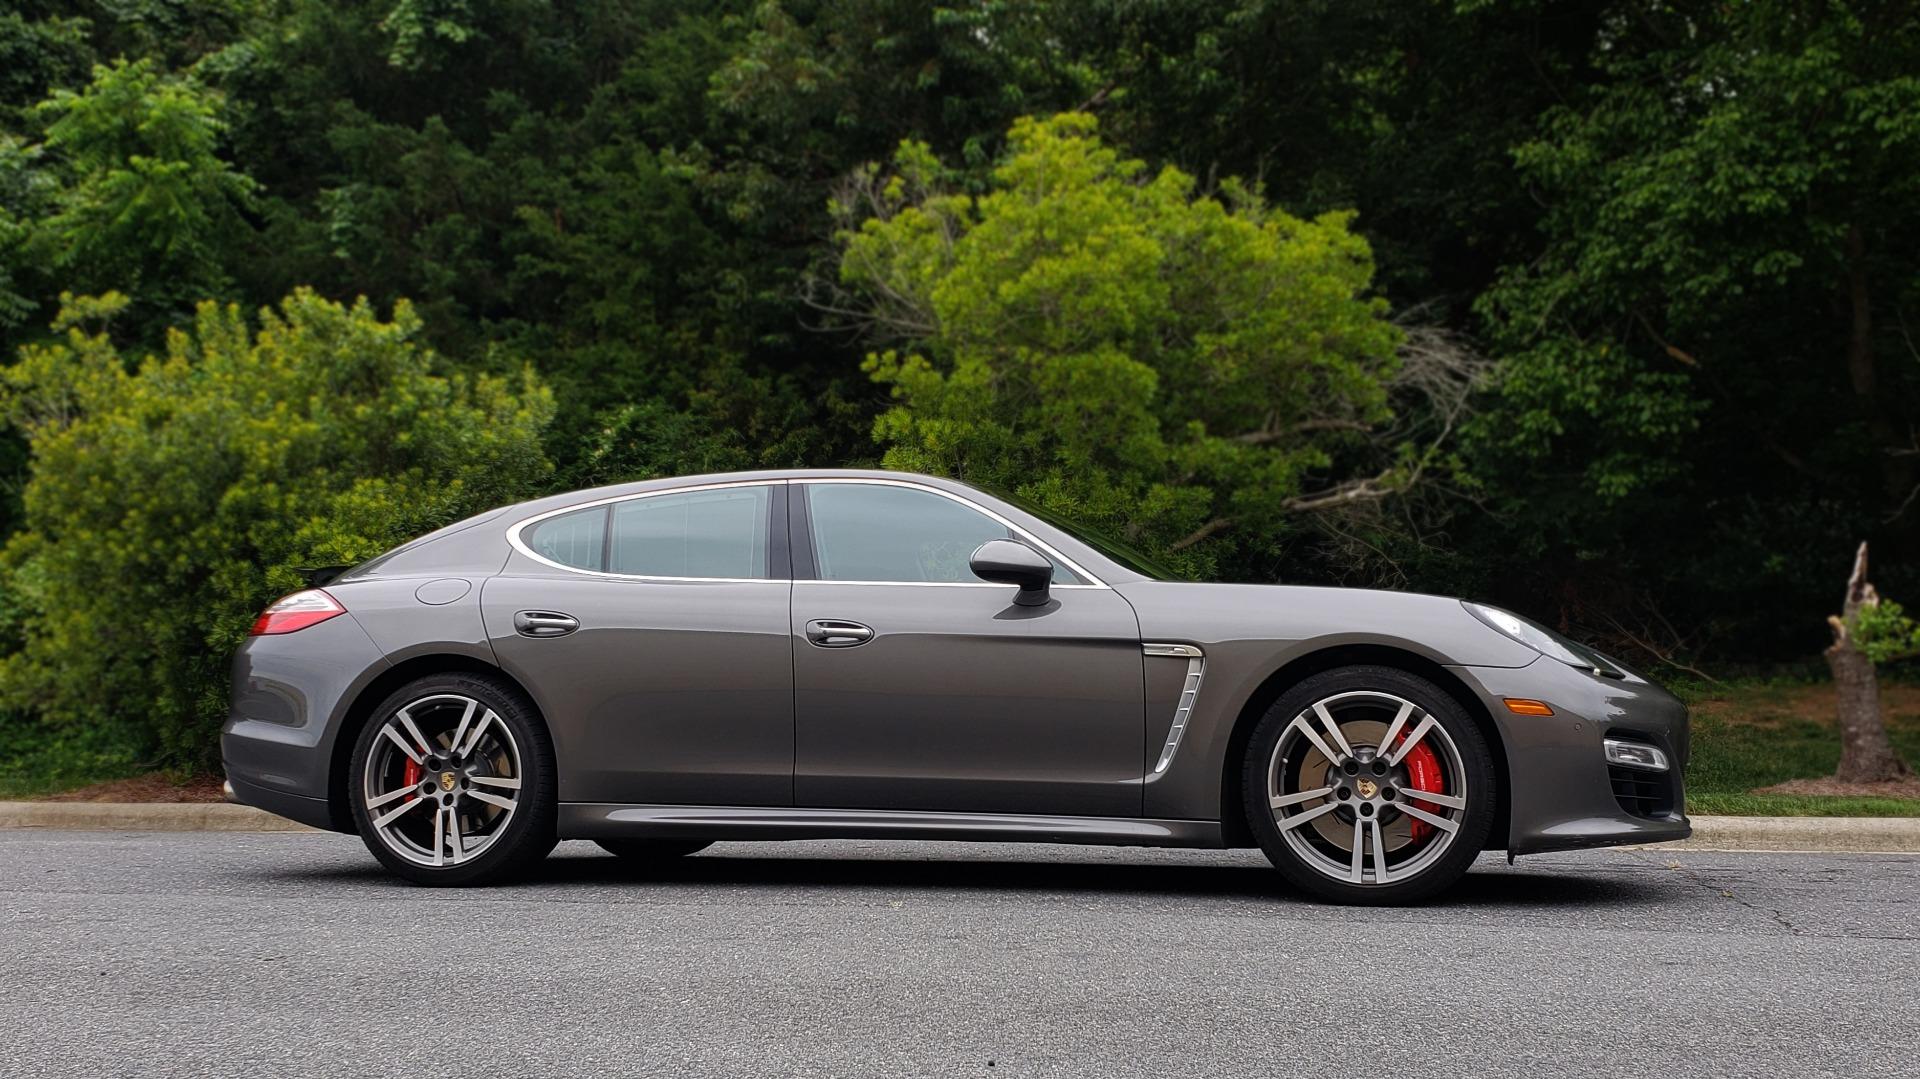 Used 2013 Porsche PANAMERA TURBO 4.8L V8 / AWD / NAV / SUNROOF / LCA / PARK ASST / BURMESTER for sale $45,995 at Formula Imports in Charlotte NC 28227 5